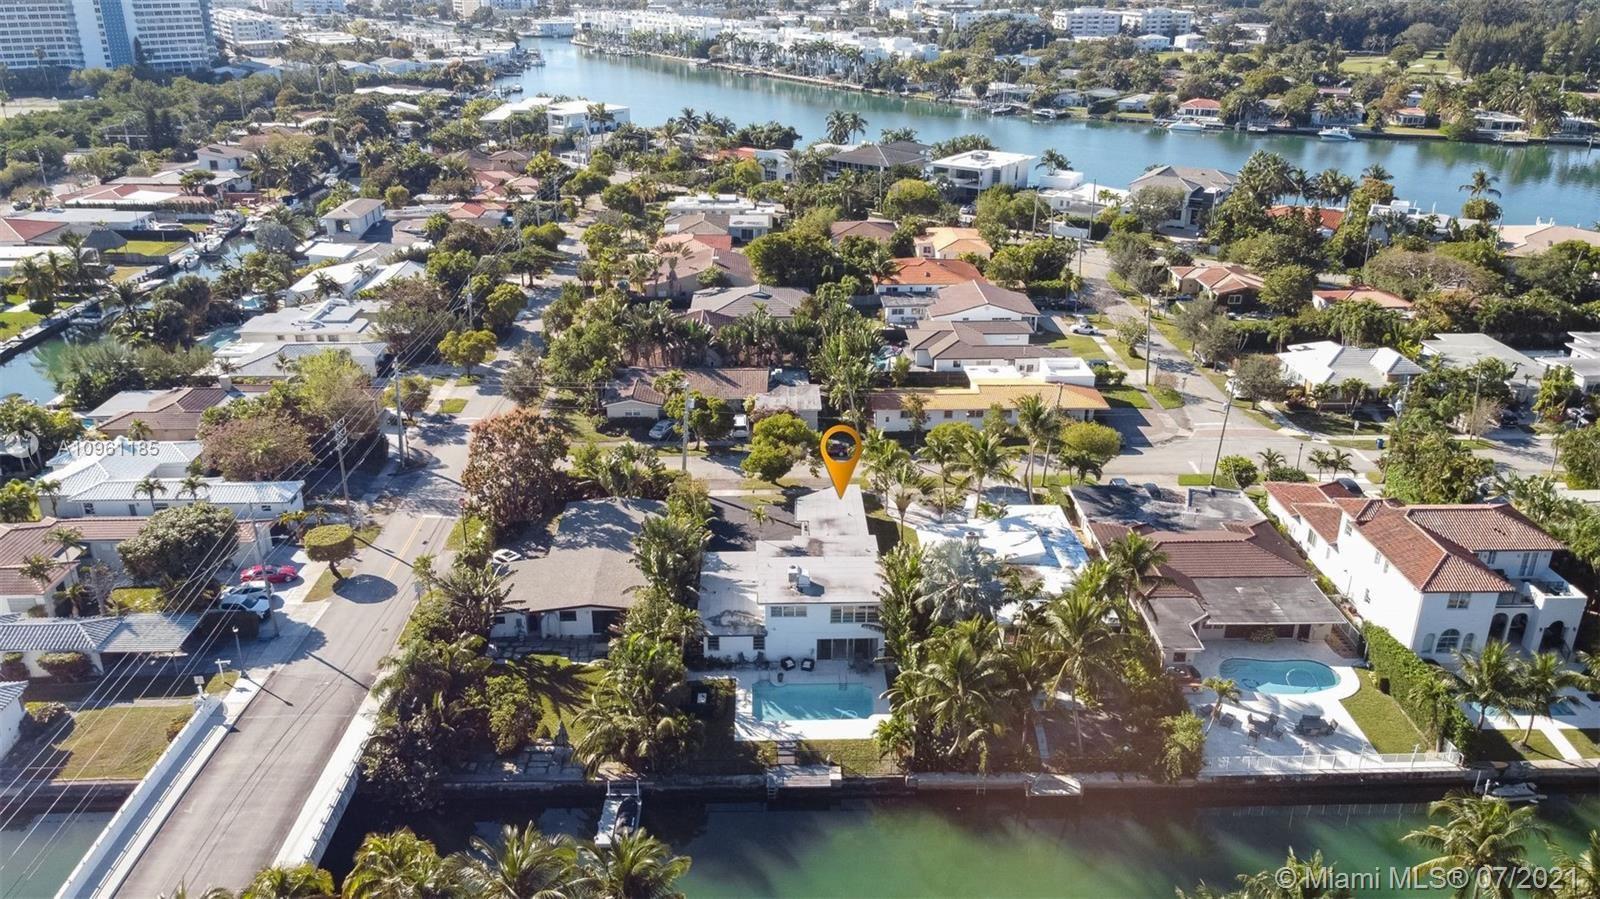 1215 Daytonia Rd, Miami Beach, FL 33141 - #: A10961185